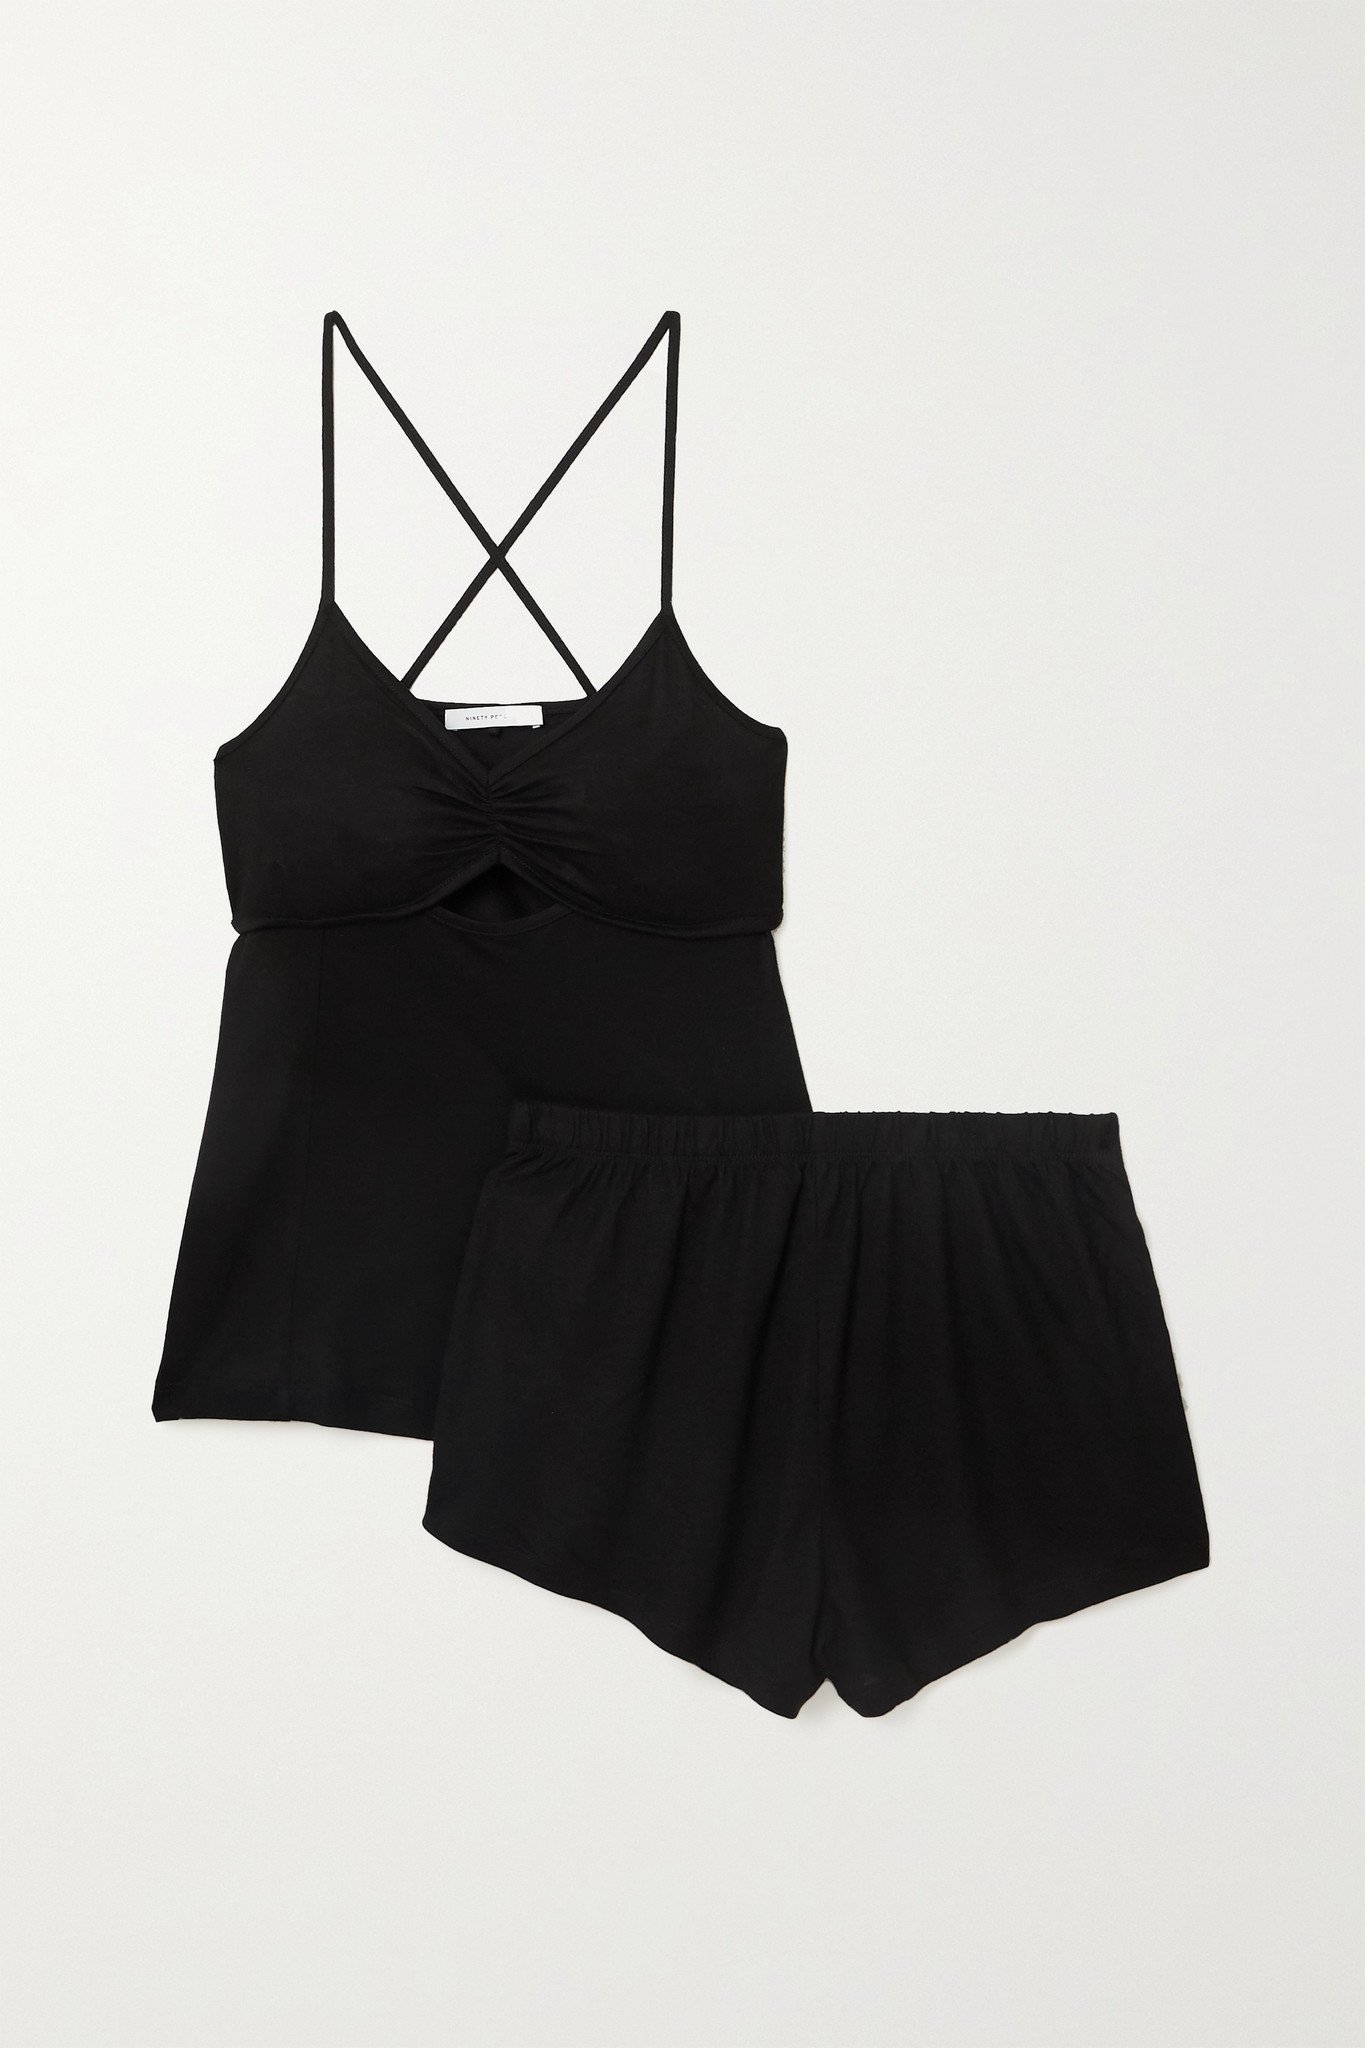 NINETY PERCENT - 【net Sustain】拉绒天丝睡衣套装 - 黑色 - small